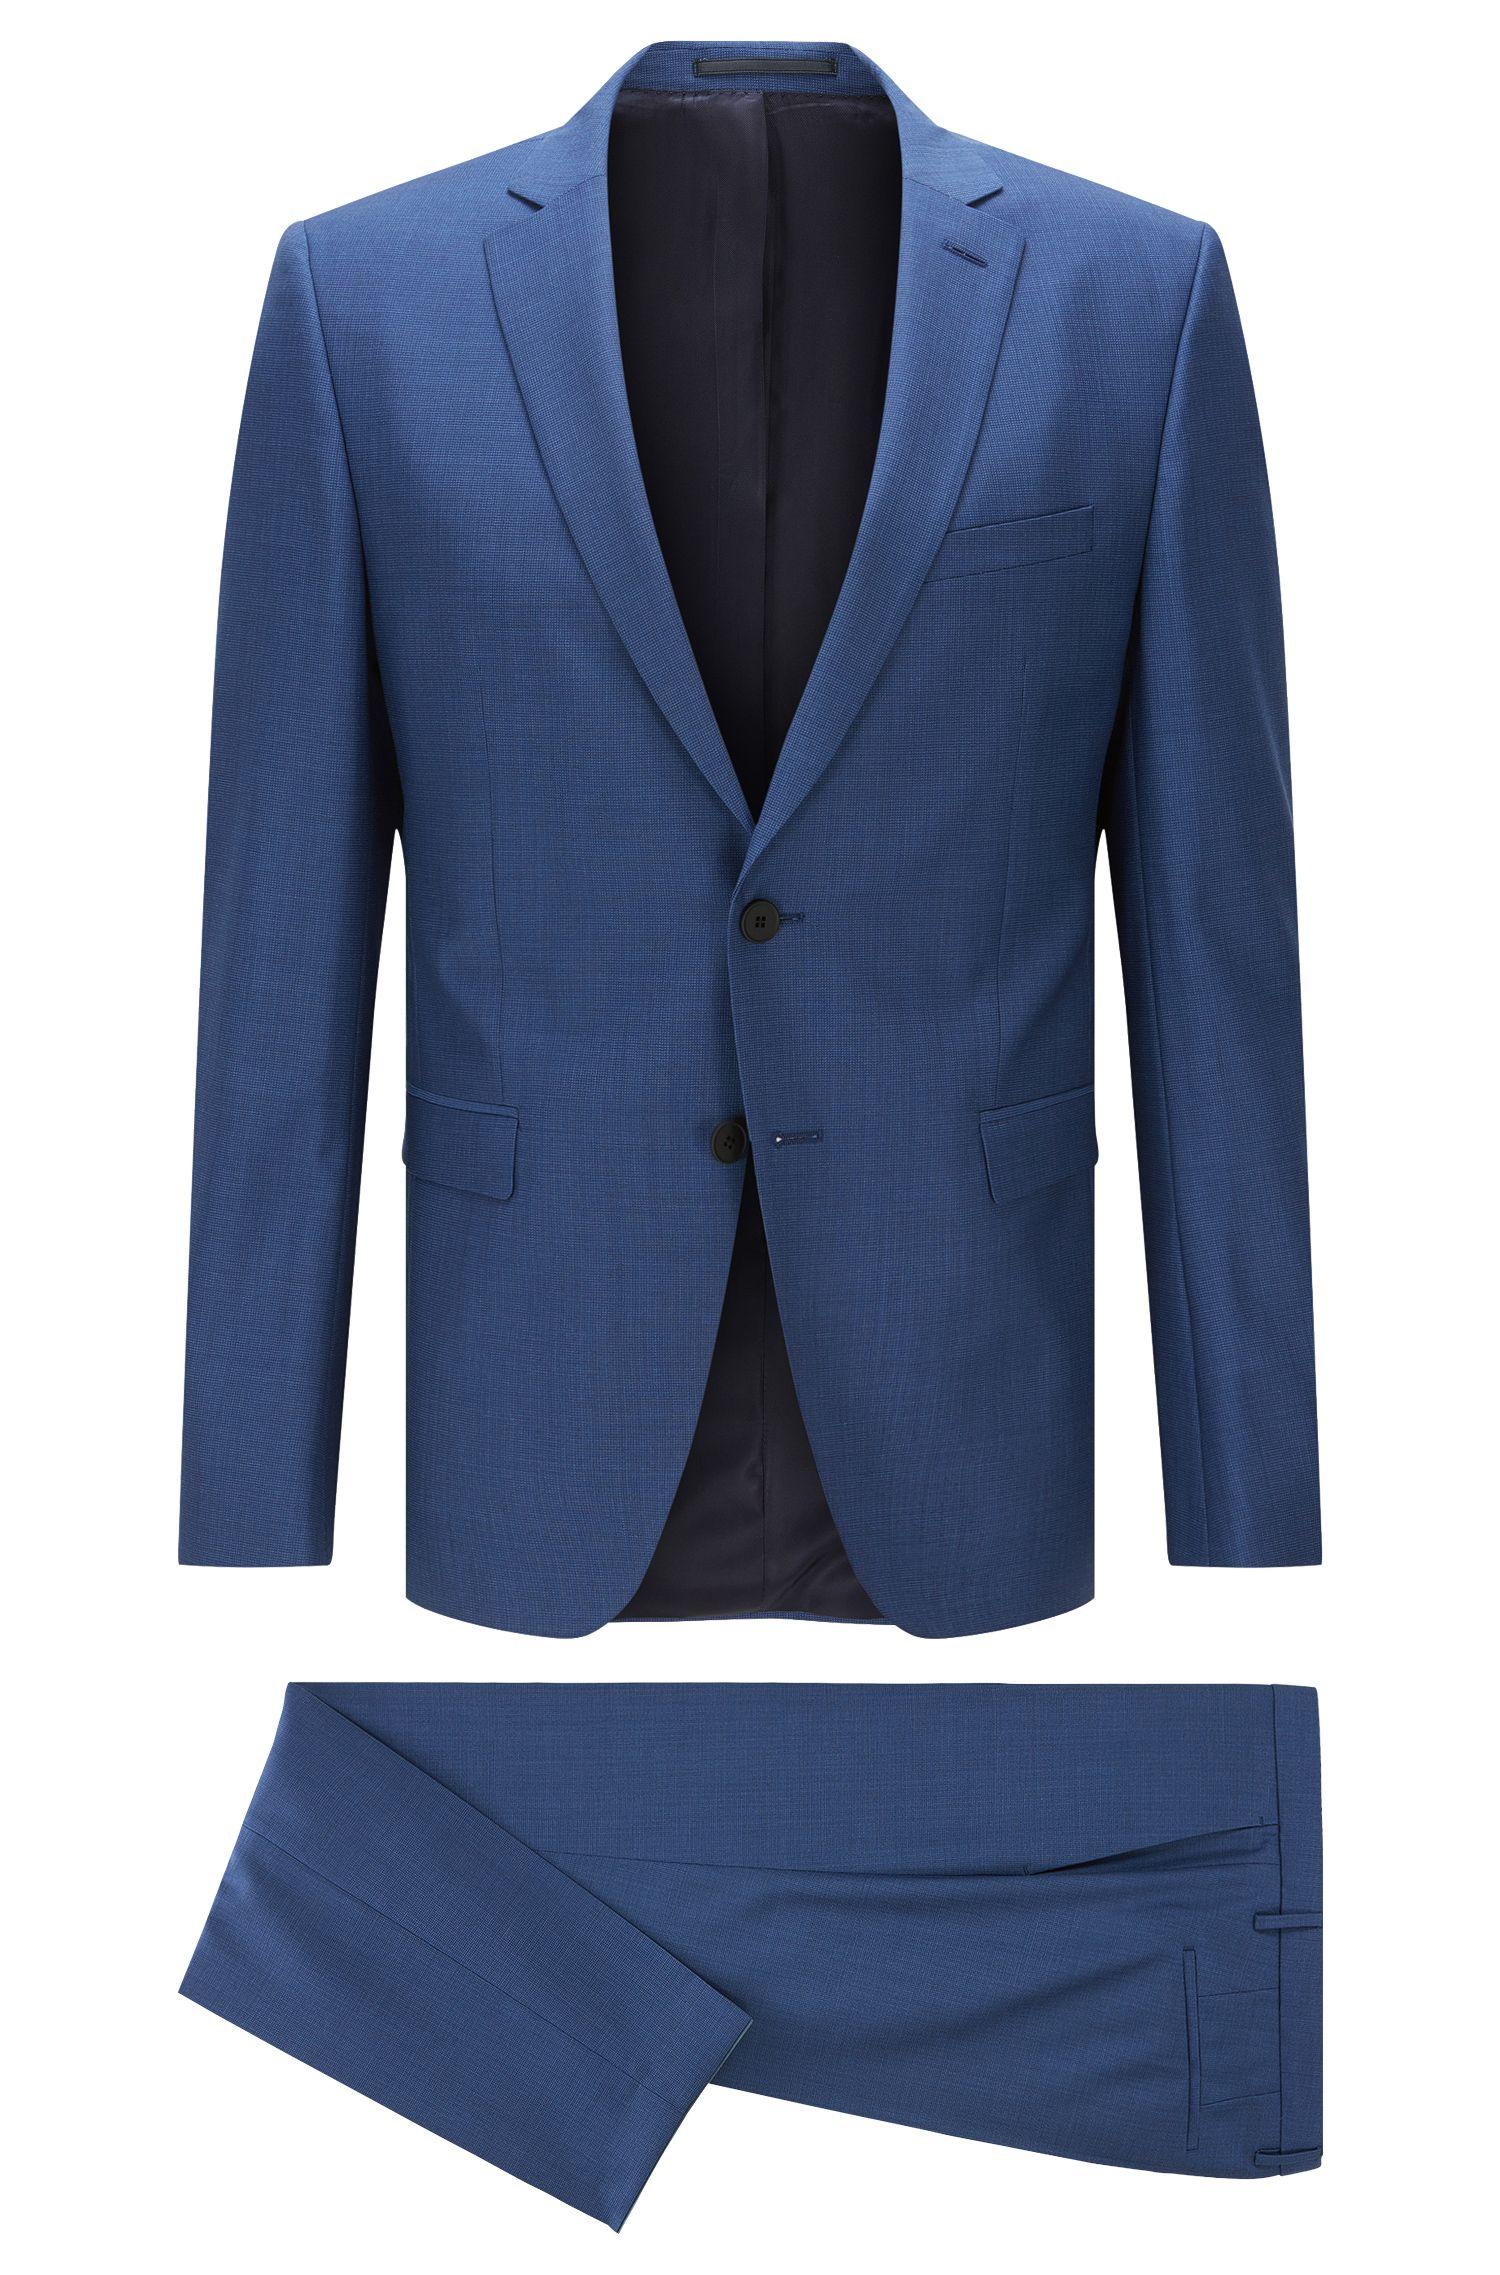 Super 100 Wool Suit, Extra Slim Fit | Reymond/Wenton